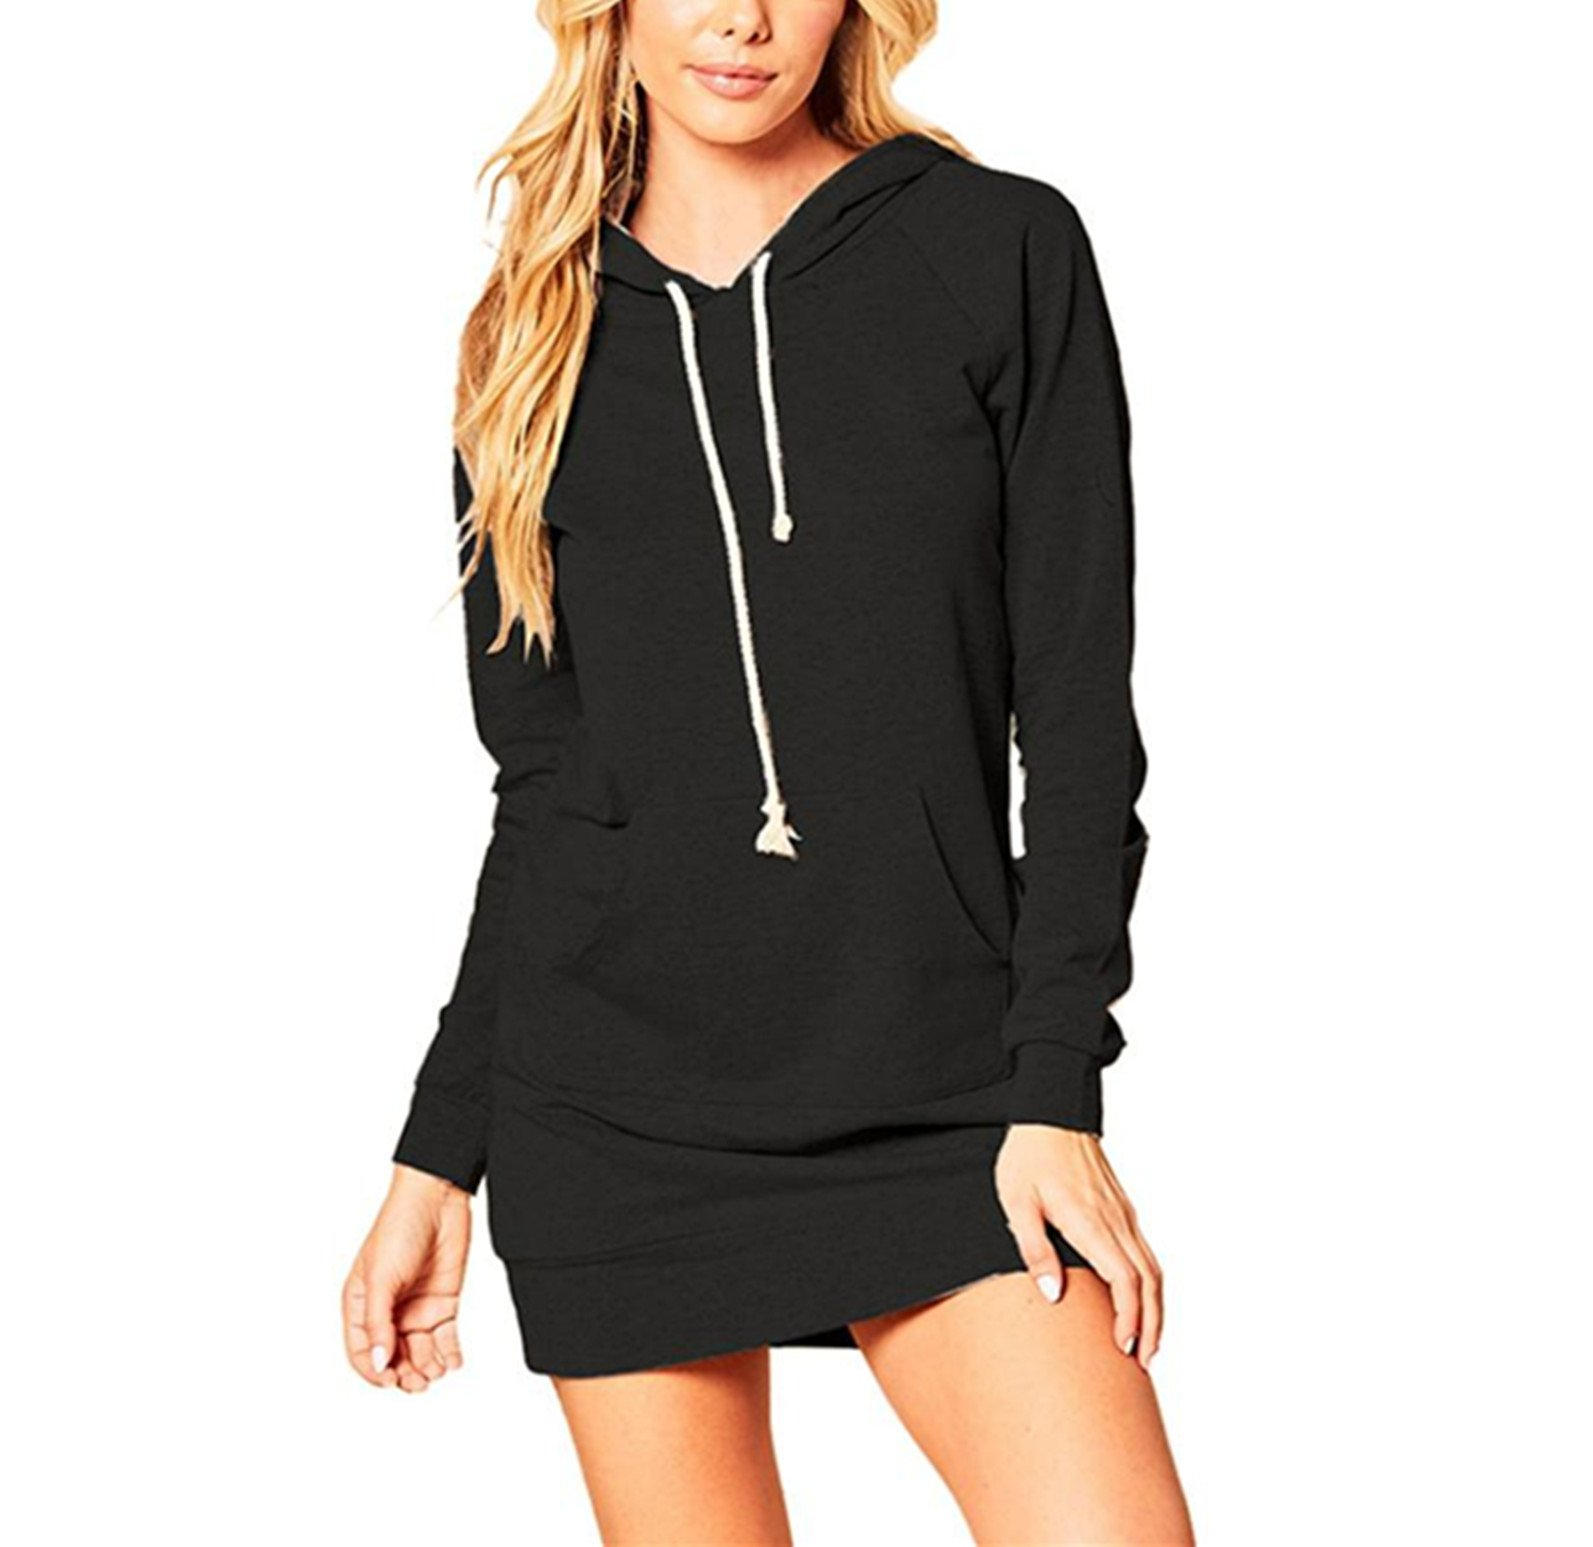 BSGSH Women Pullover Sweatshirt Long Sleeves Tunic Hoodie Dress with Kangaroo Pocket (S, Black)